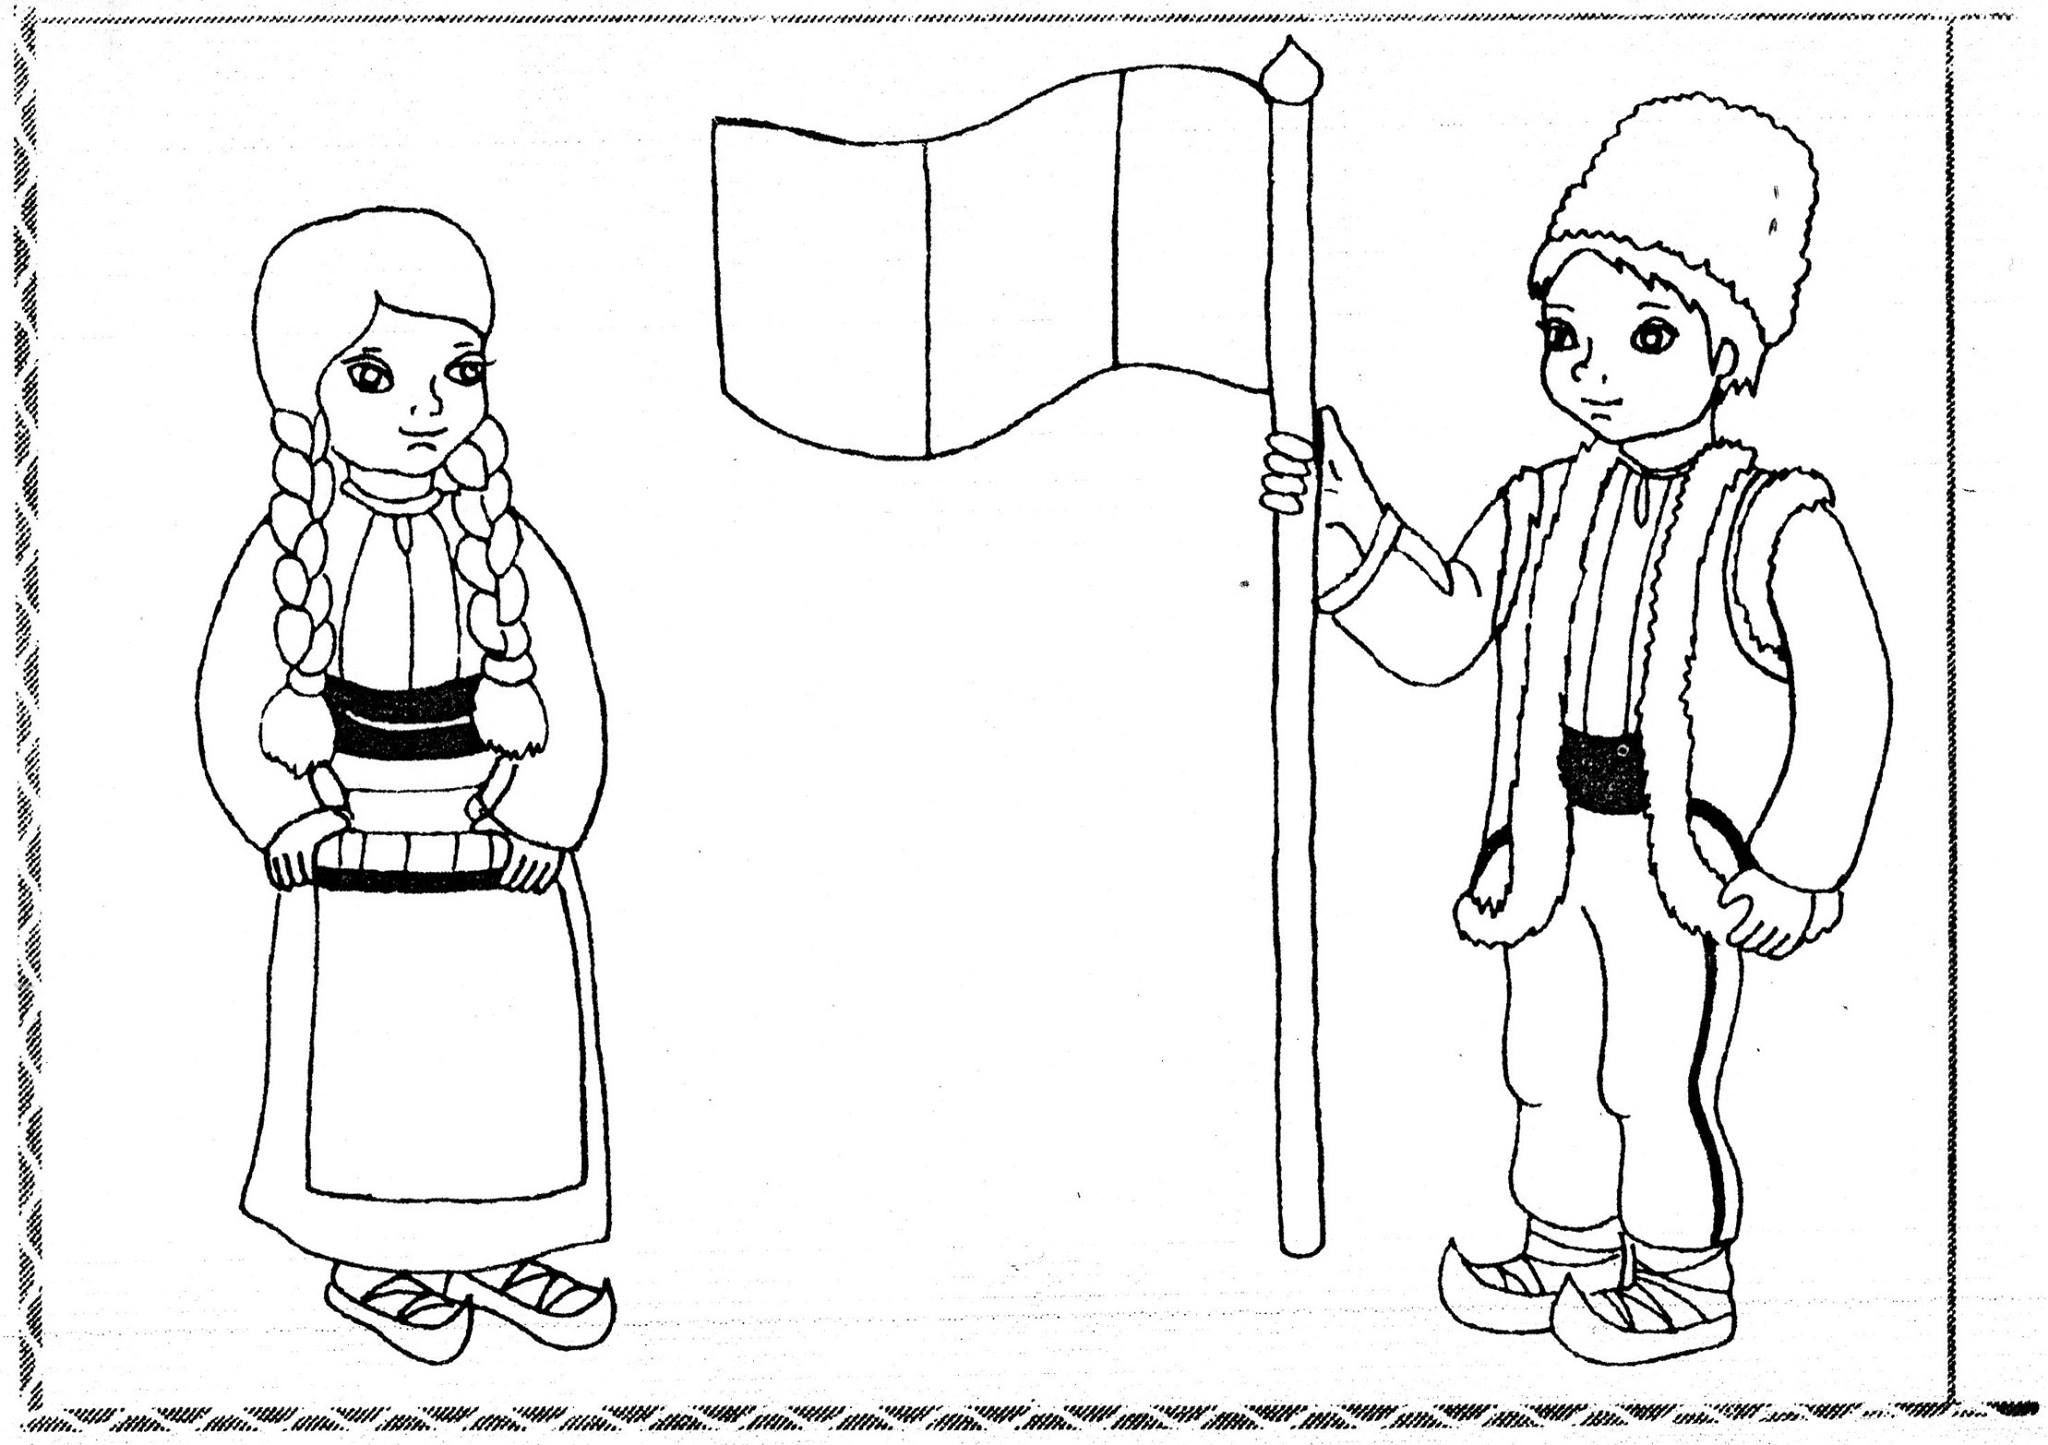 De Colorat Copii Romania Decolorat Coloringpages